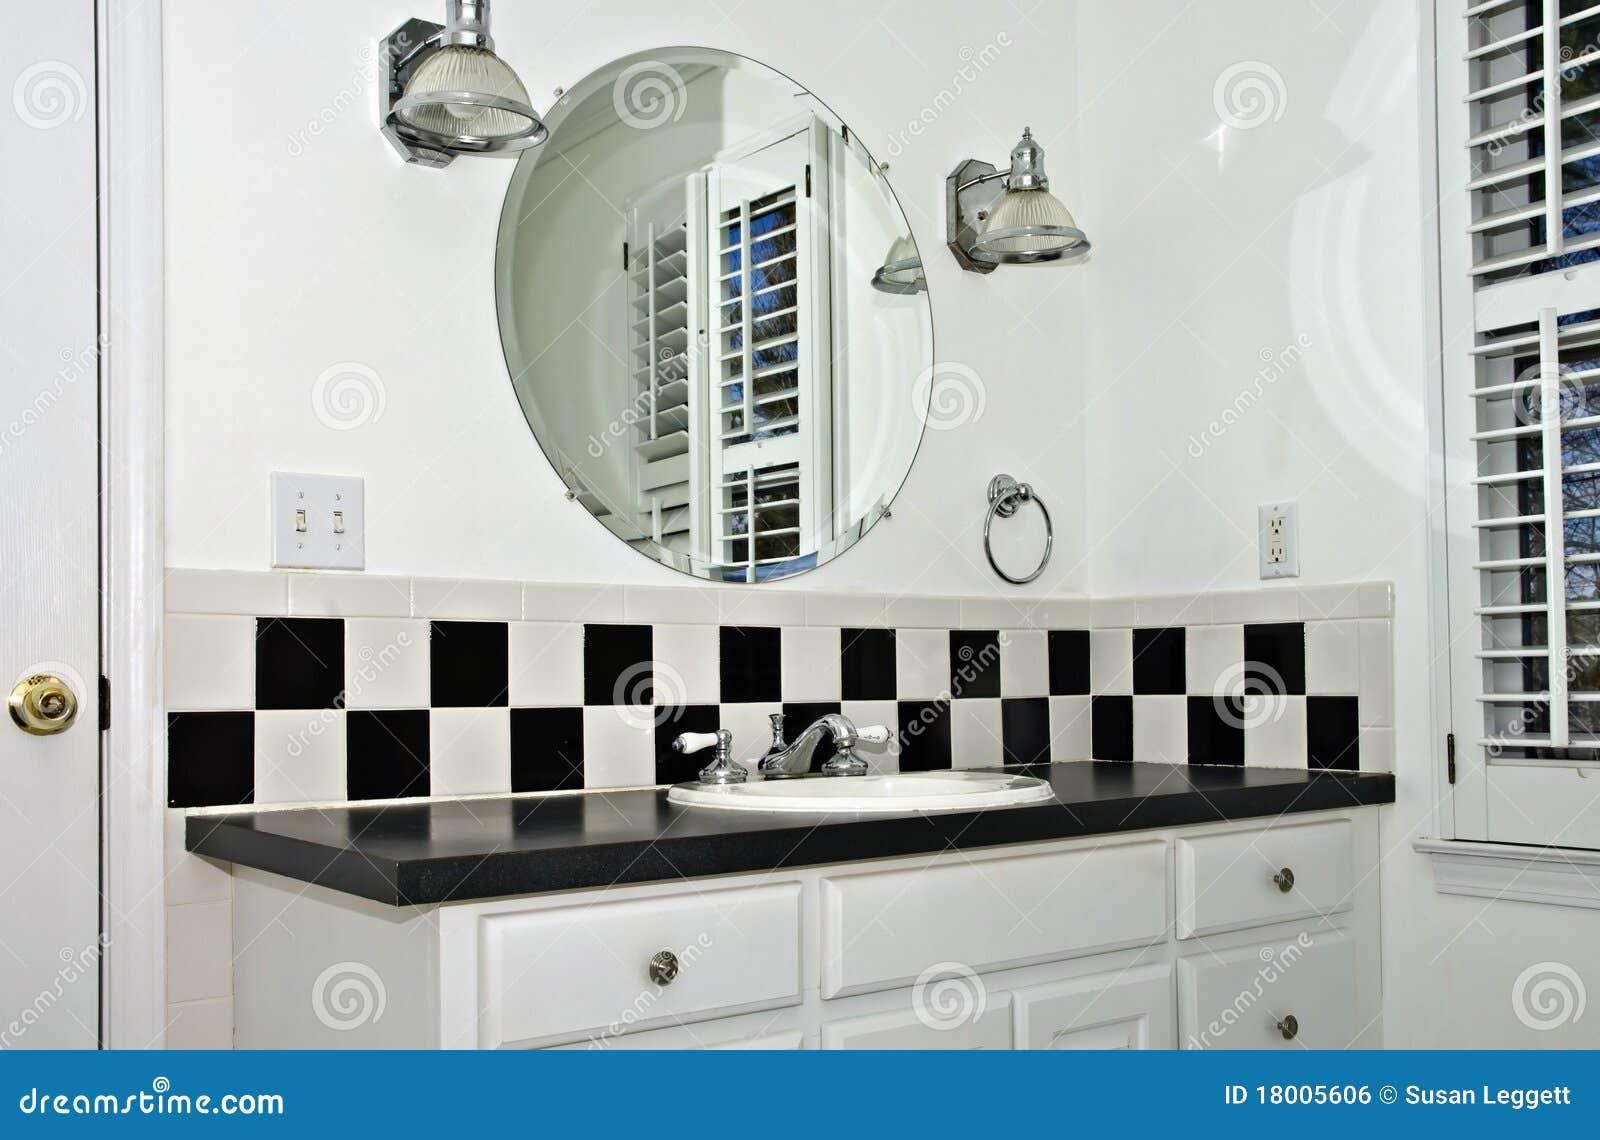 Petite salle de bains blanche image libre de droits for Petite salle de bain blanche